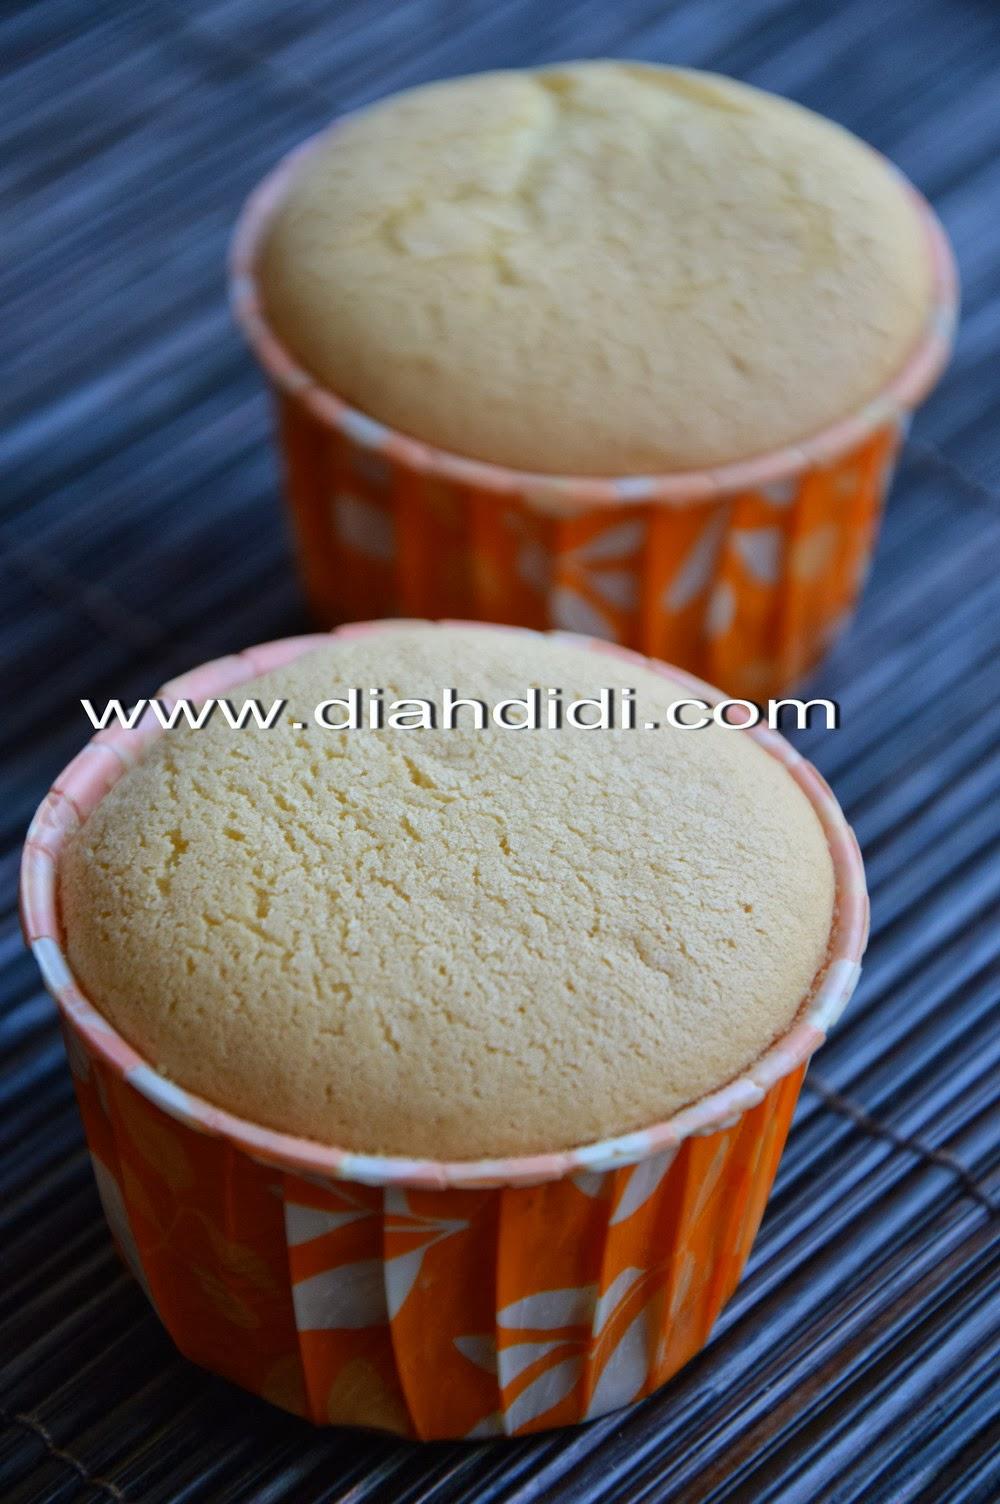 Diah Didis Kitchen Step By Step Menghias Cupcake Sederhana